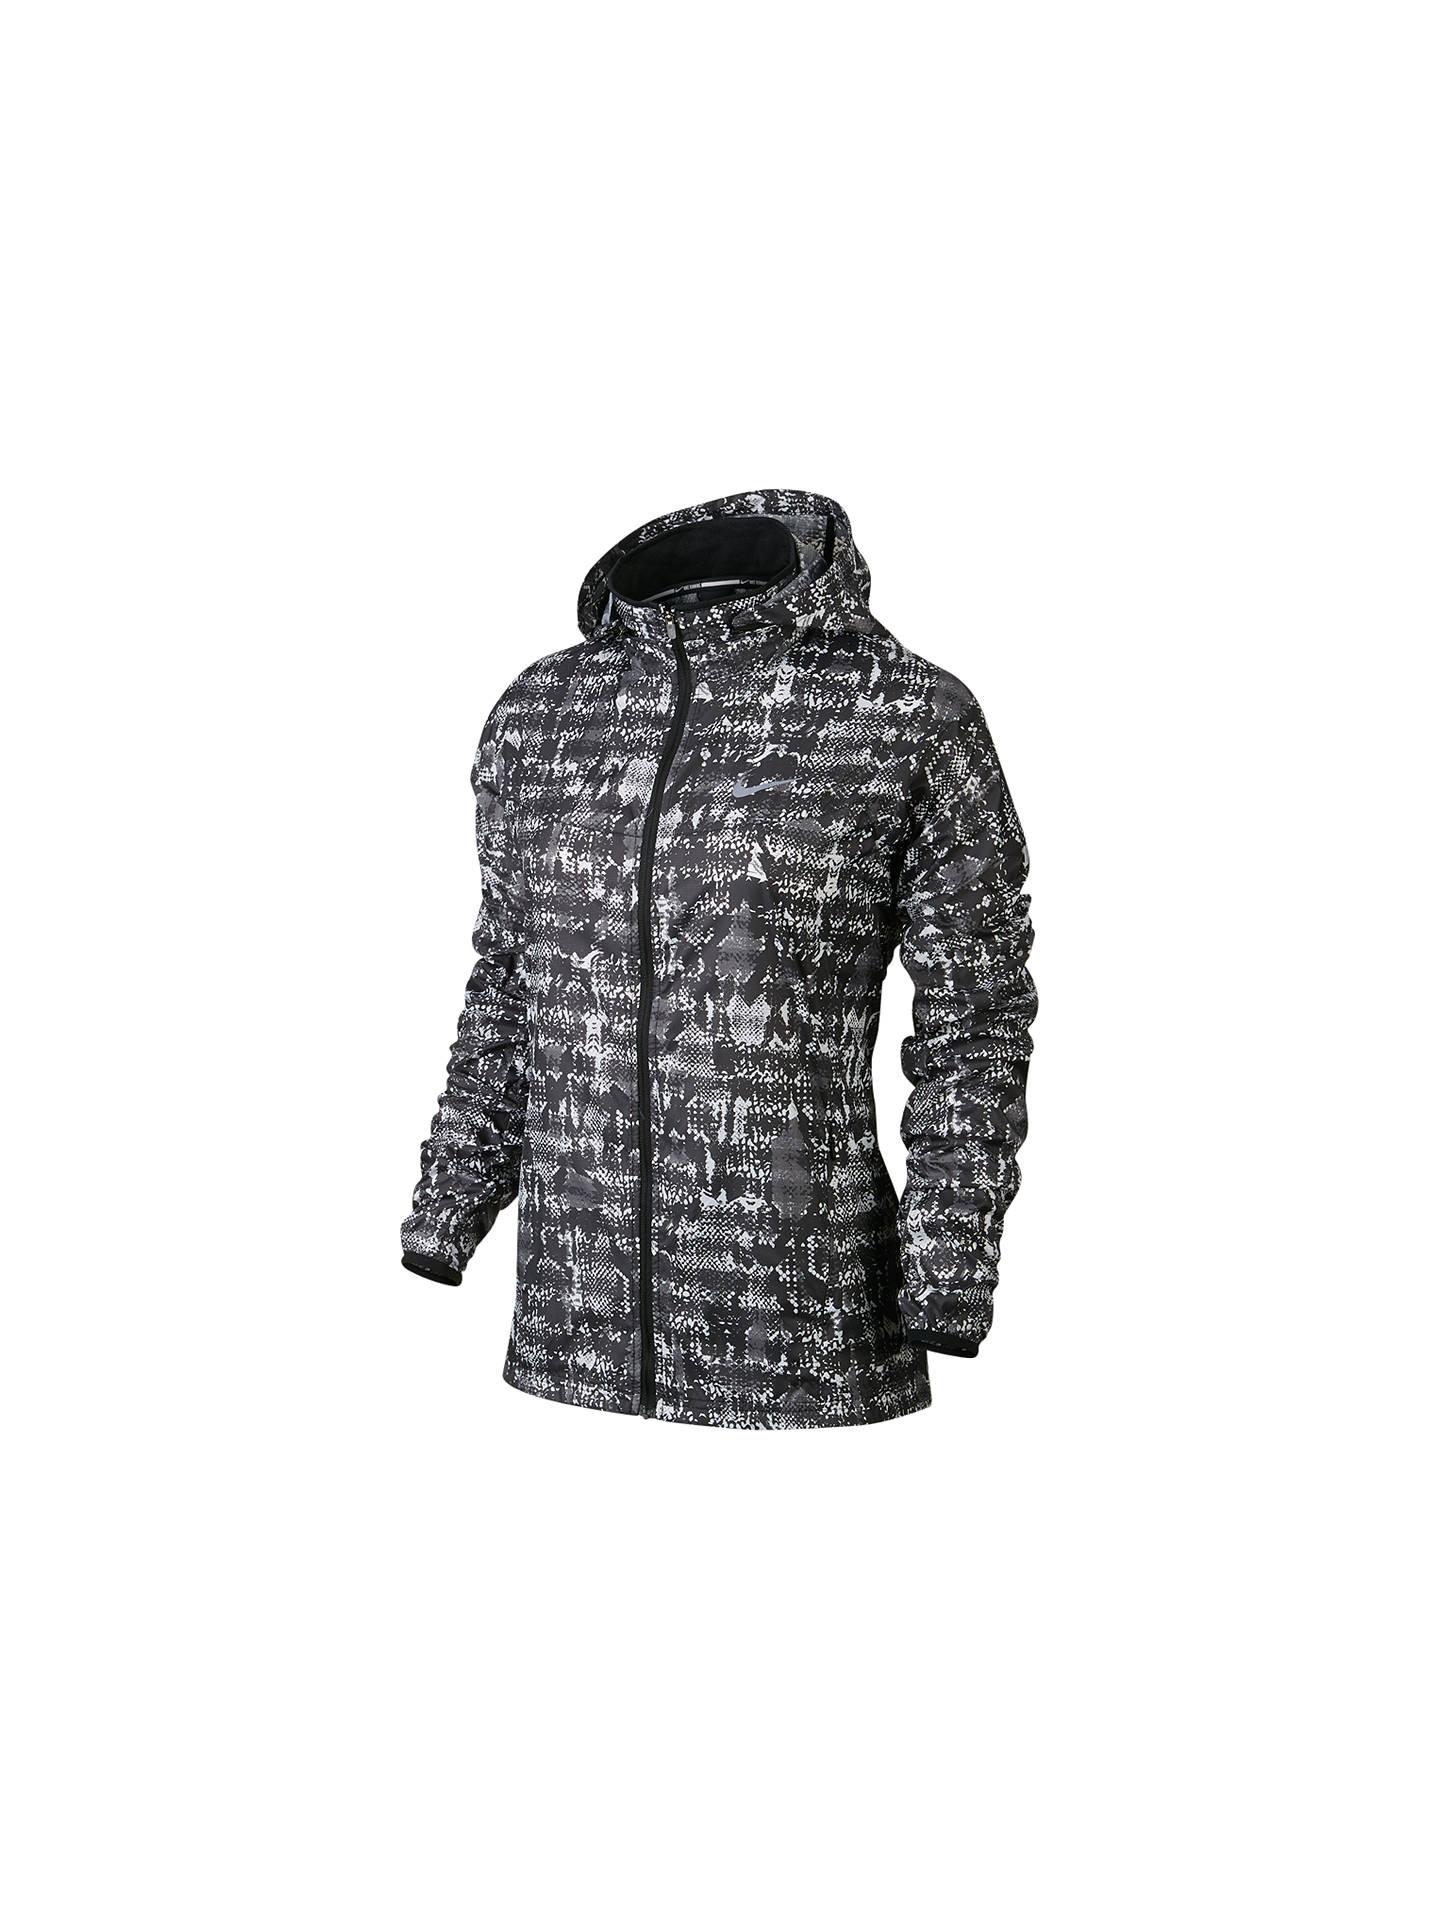 739685ceb94f Buy Nike Viper Vapor Running Jacket